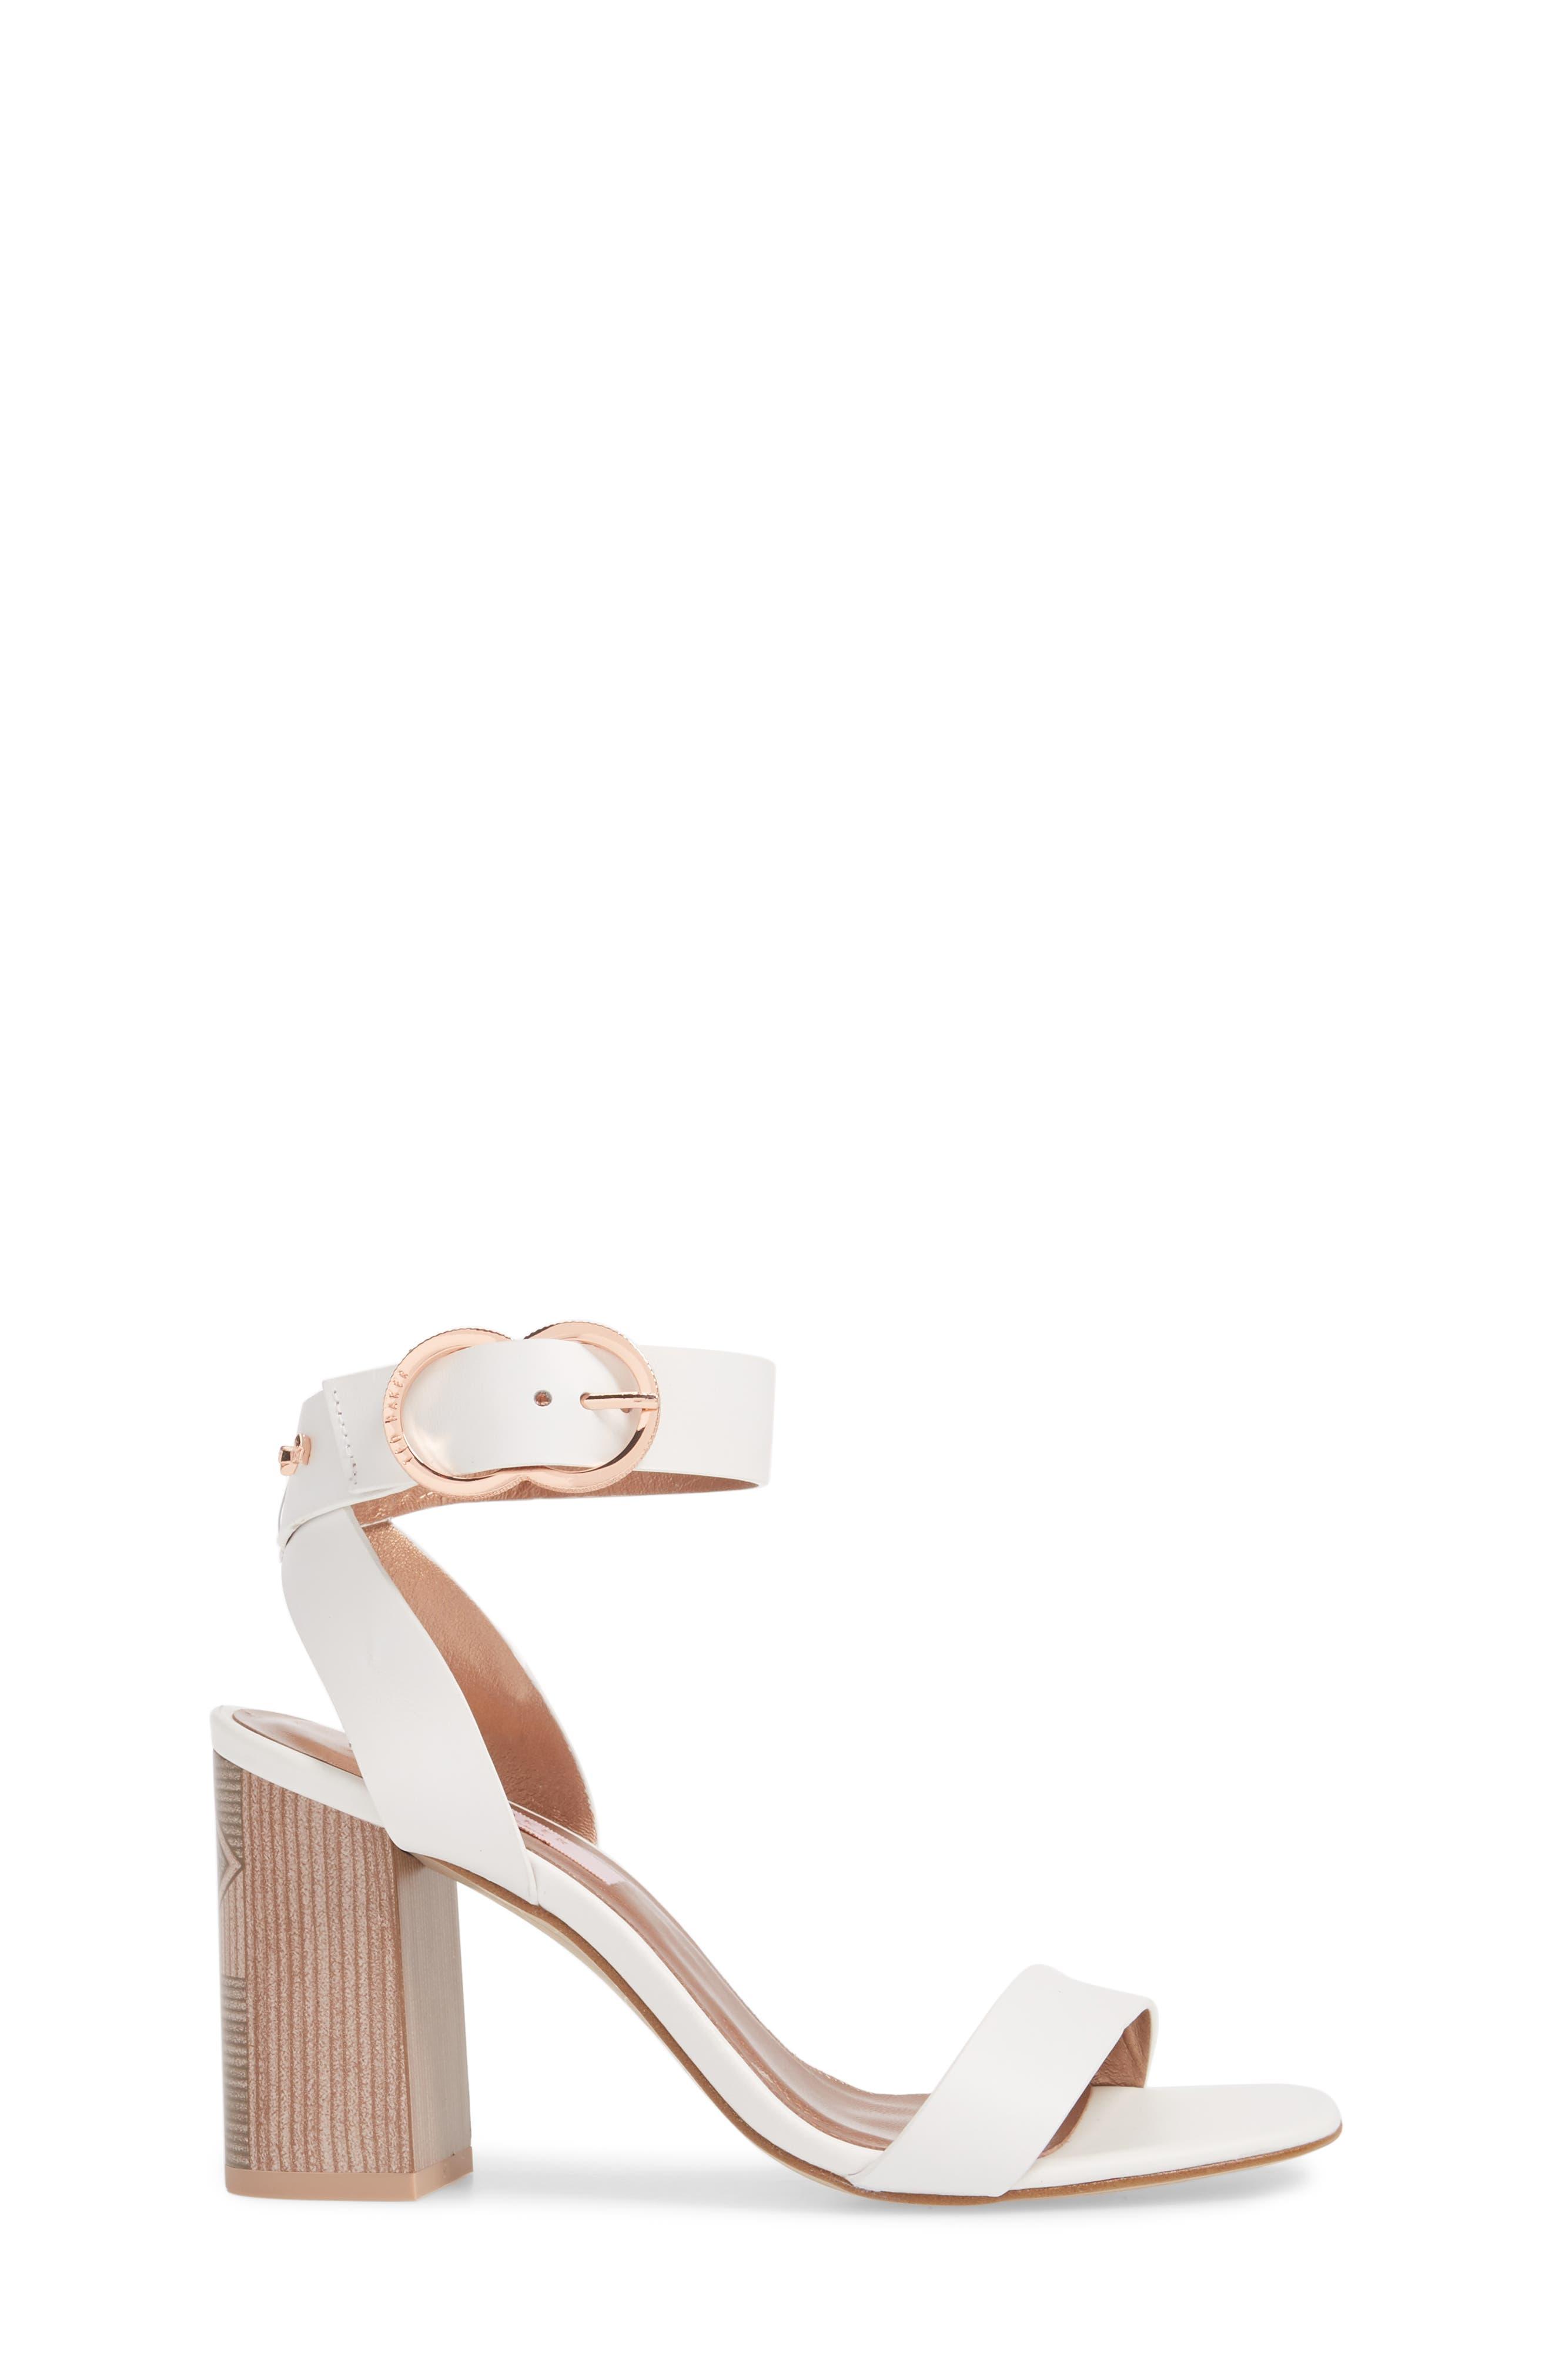 Vallama Block Heel Sandal,                             Alternate thumbnail 3, color,                             White Leather